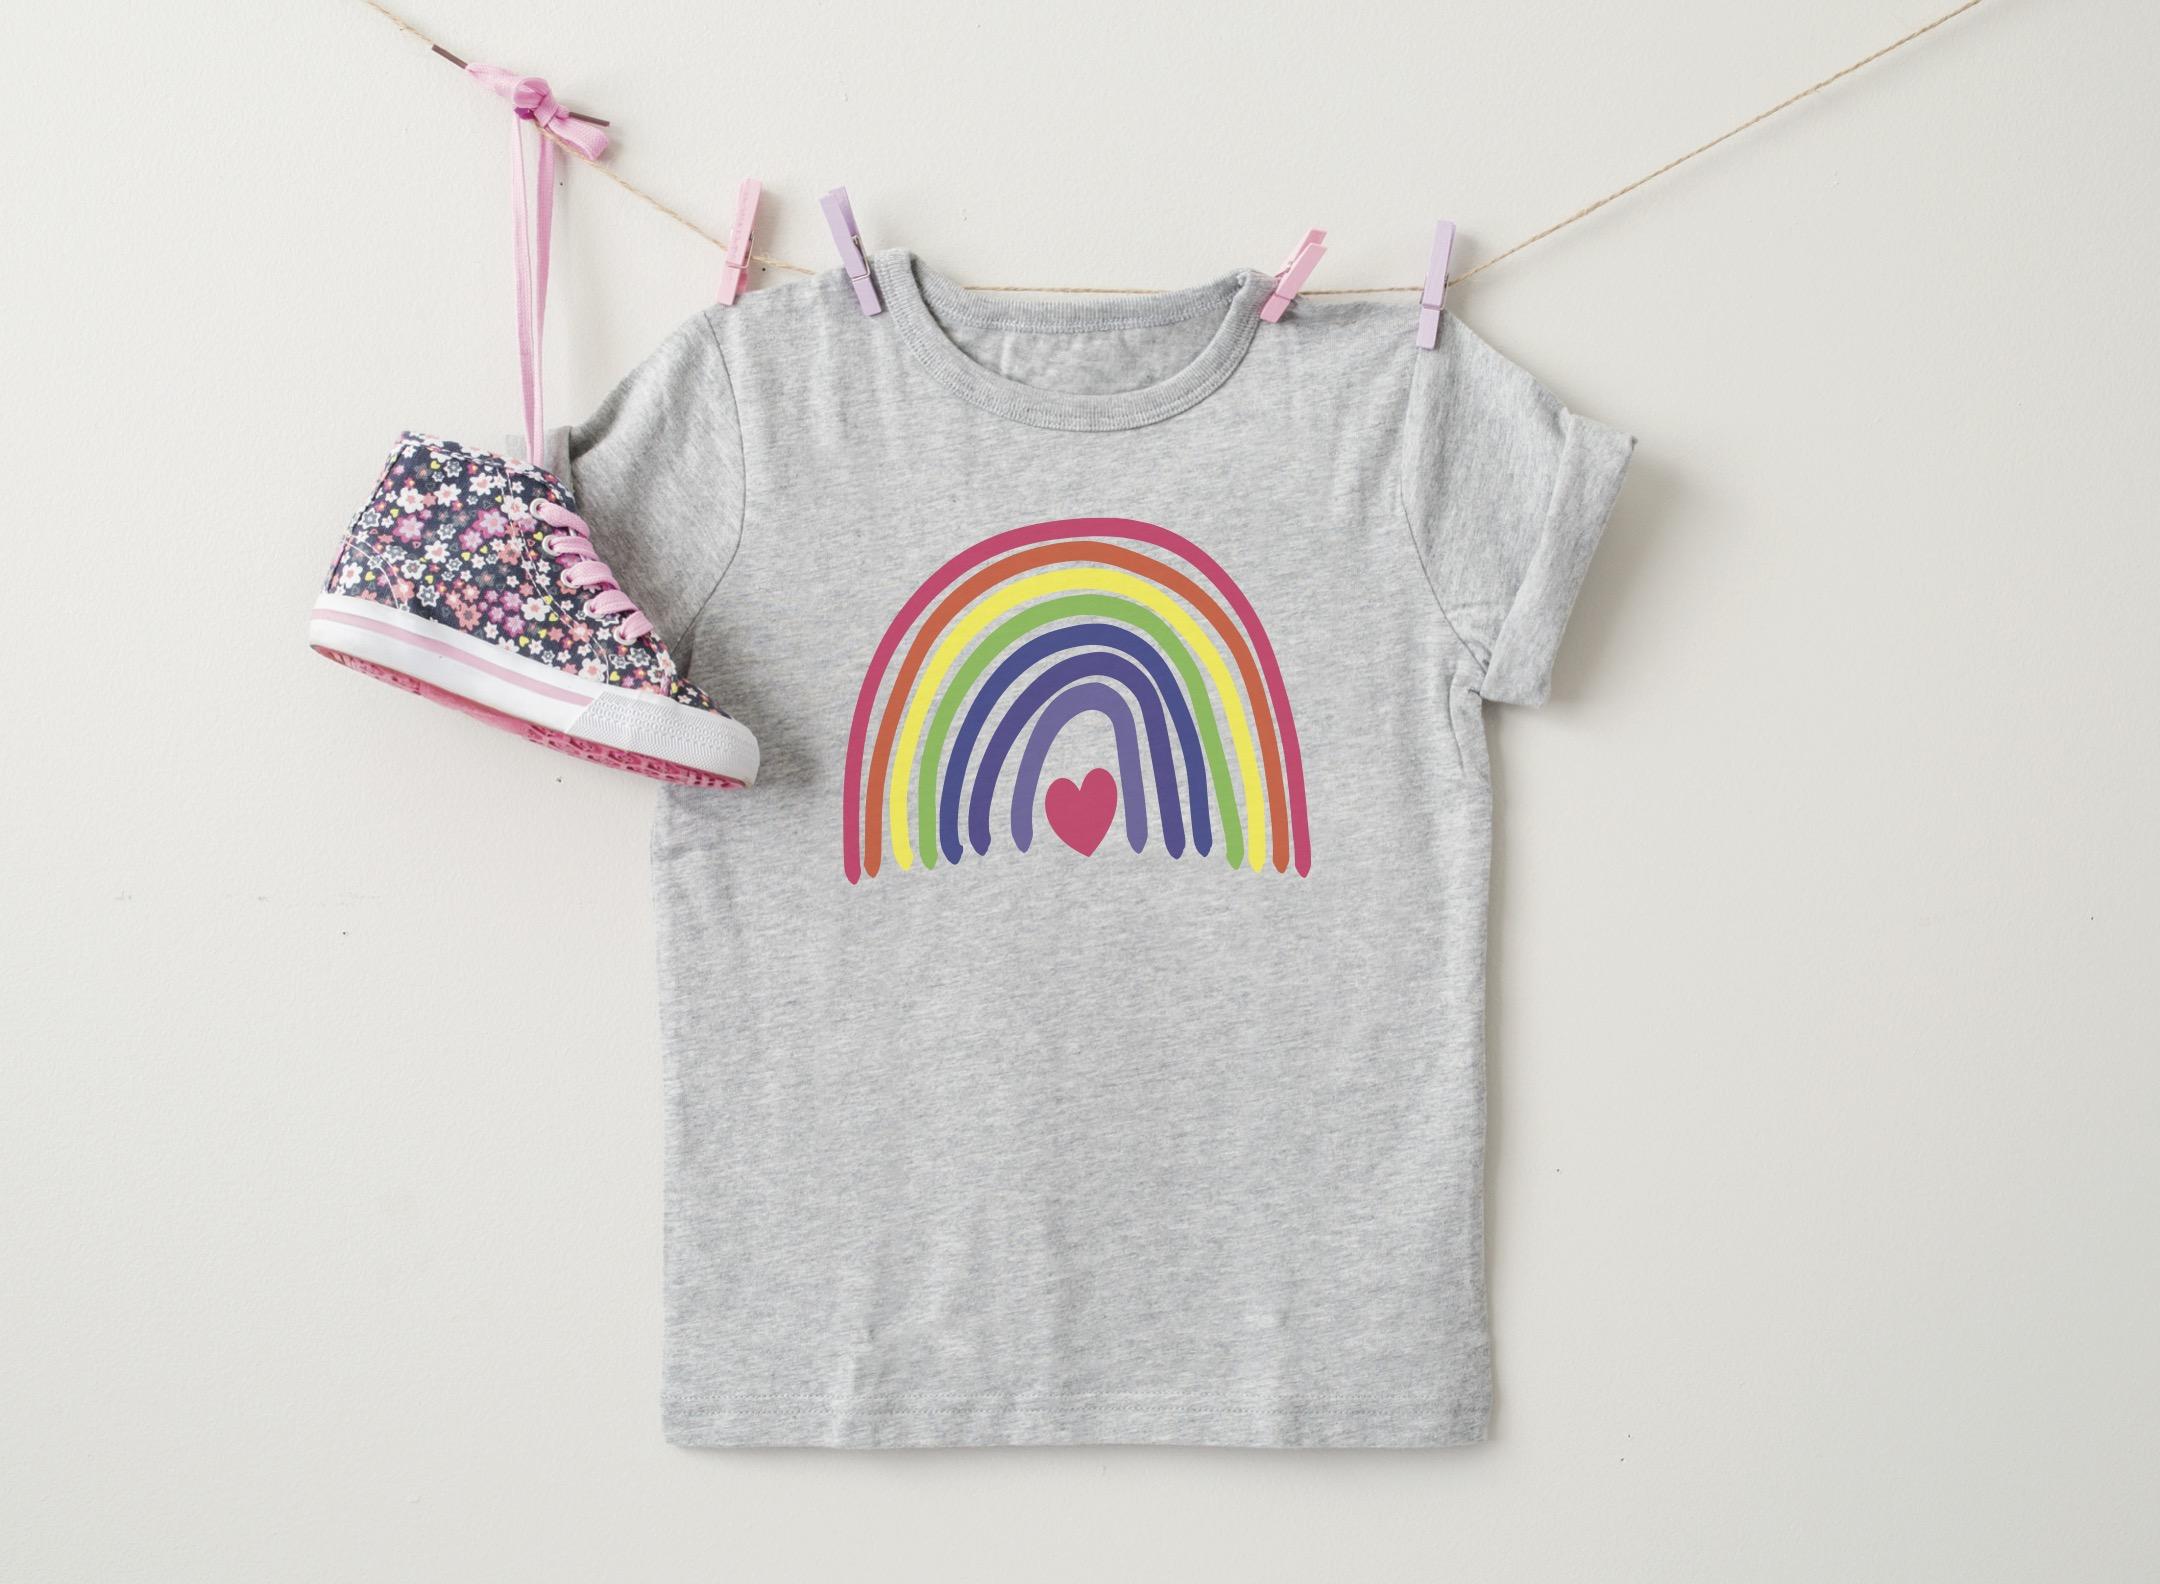 Adorable Hanging Rainbow Shirt